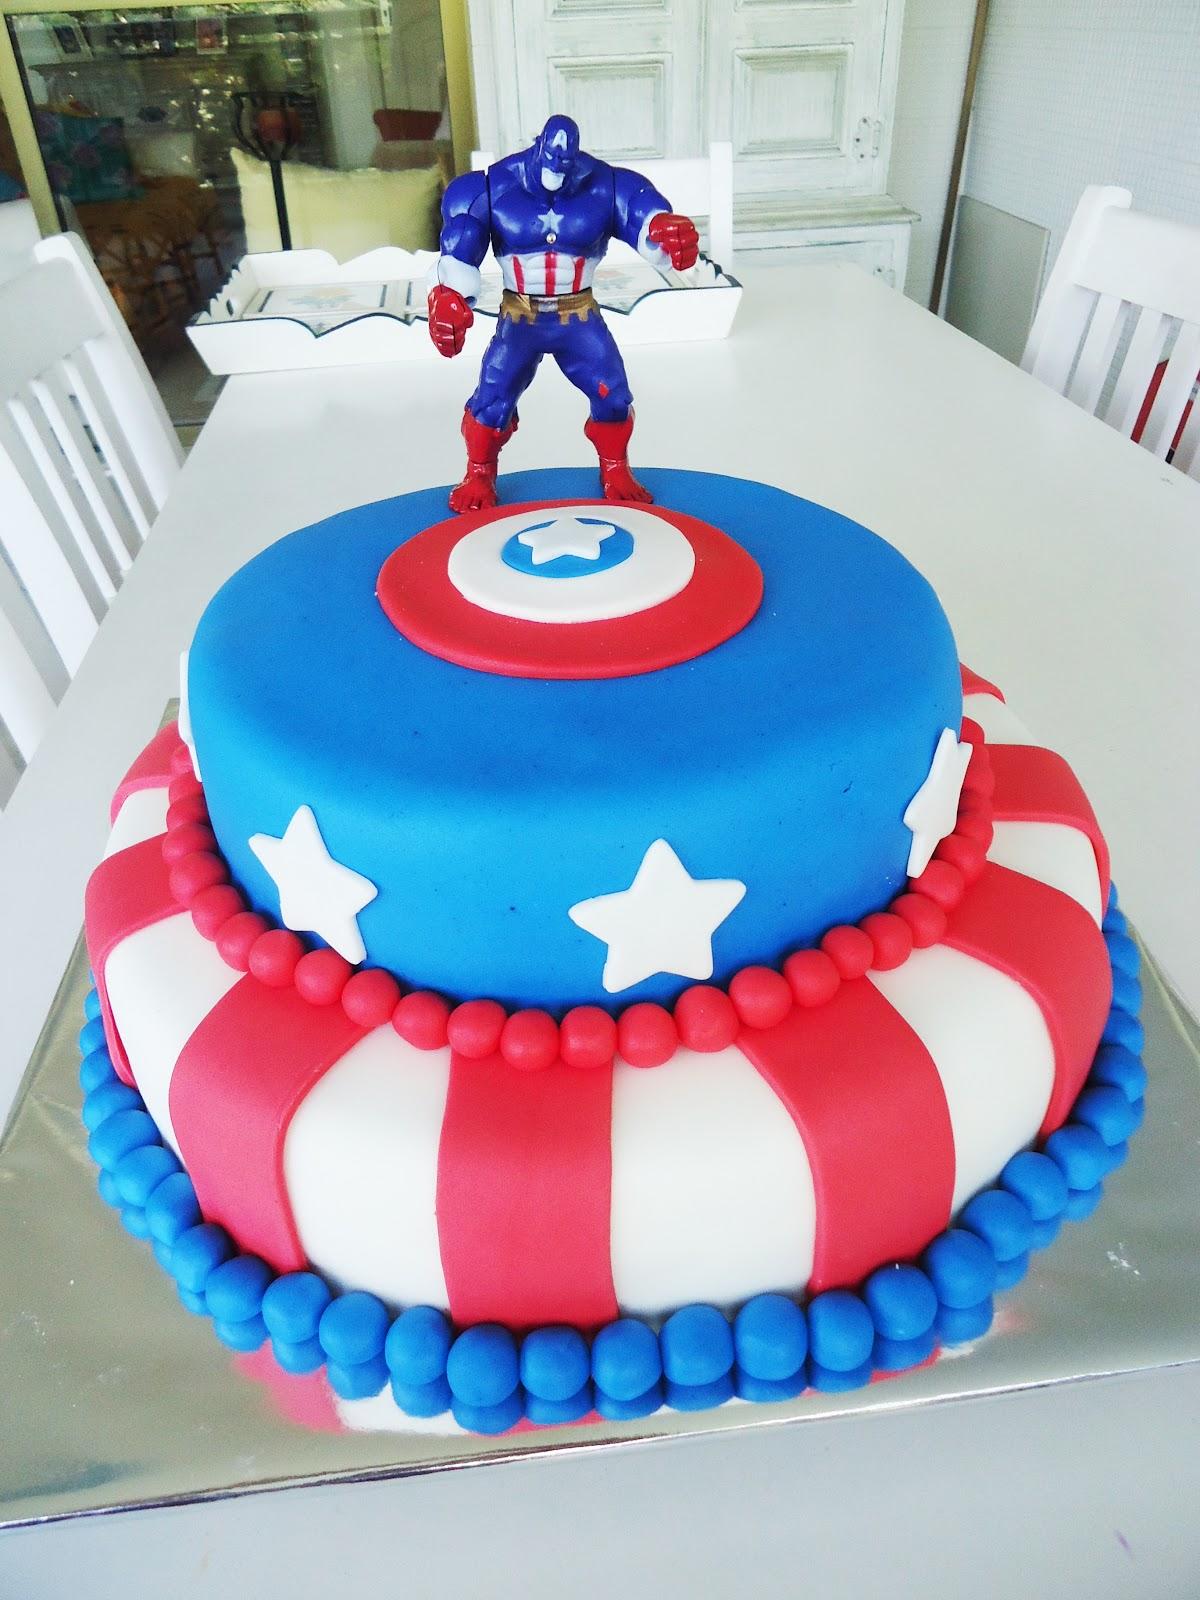 http://luquadroscakesecupcakes.blogspot.com.br/2012/06/capitao-america.html